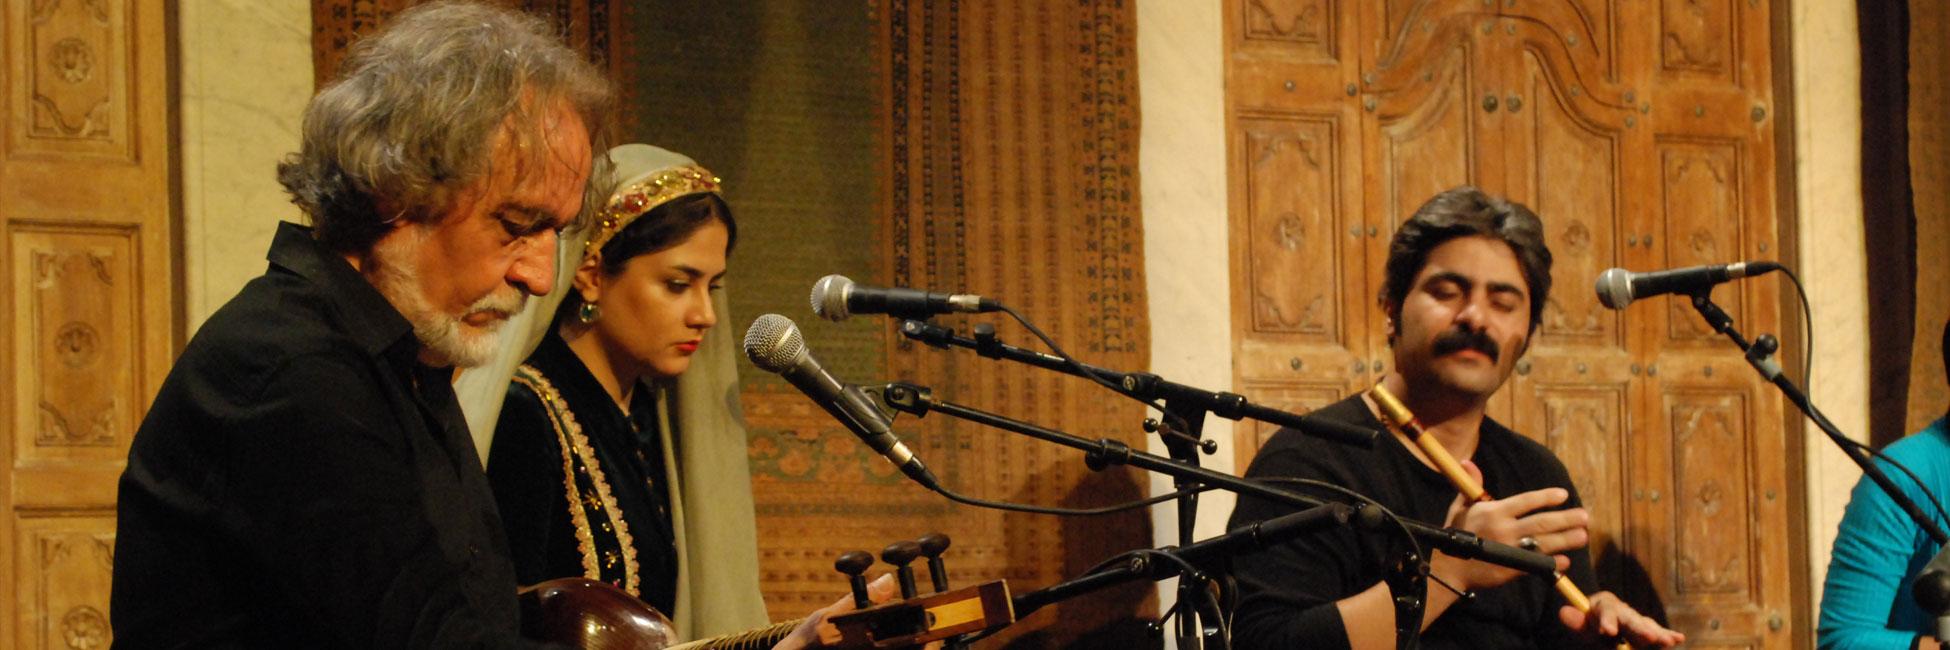 Majid Derakhshani - Musique néo-traditionnelle persane